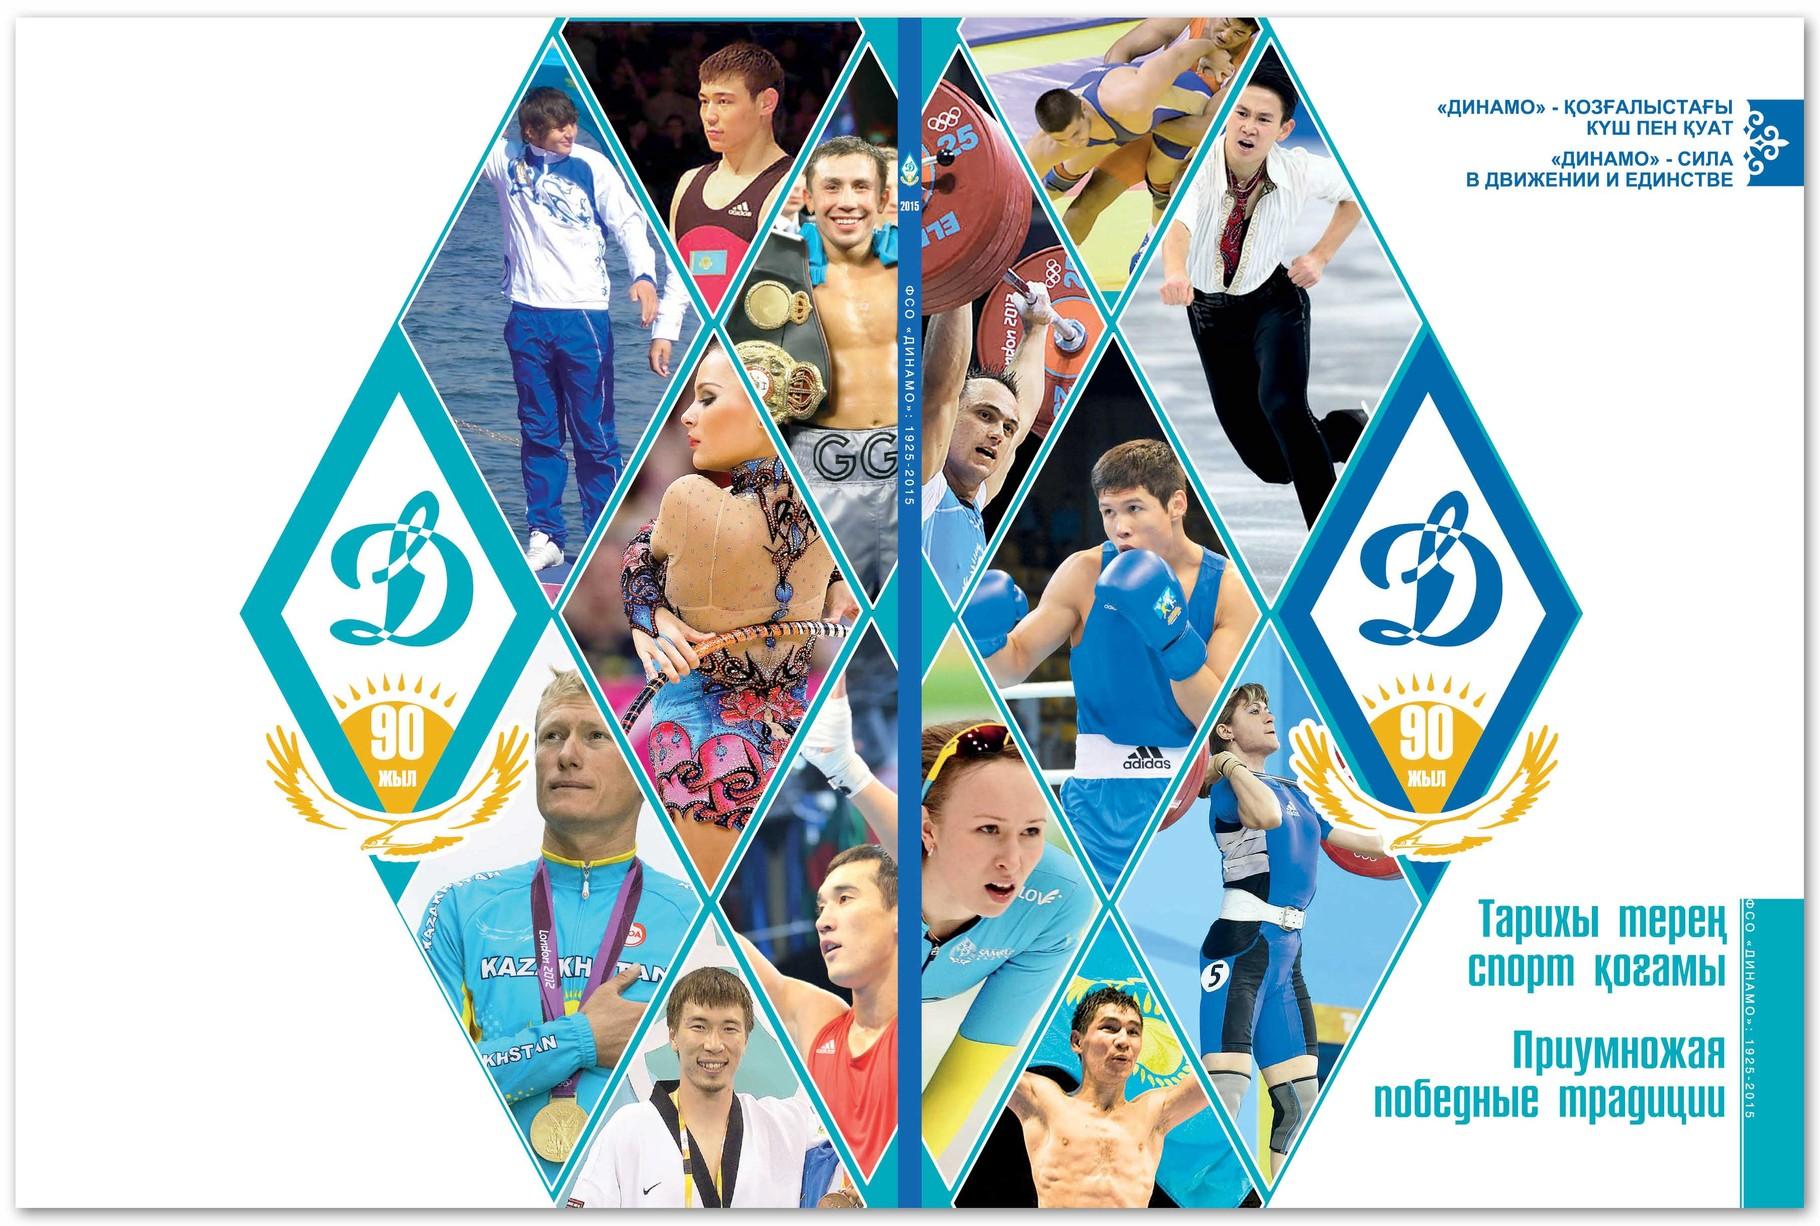 """Dynamo 90 years"".  Magazine. Cover. Dynamo. U-turn"